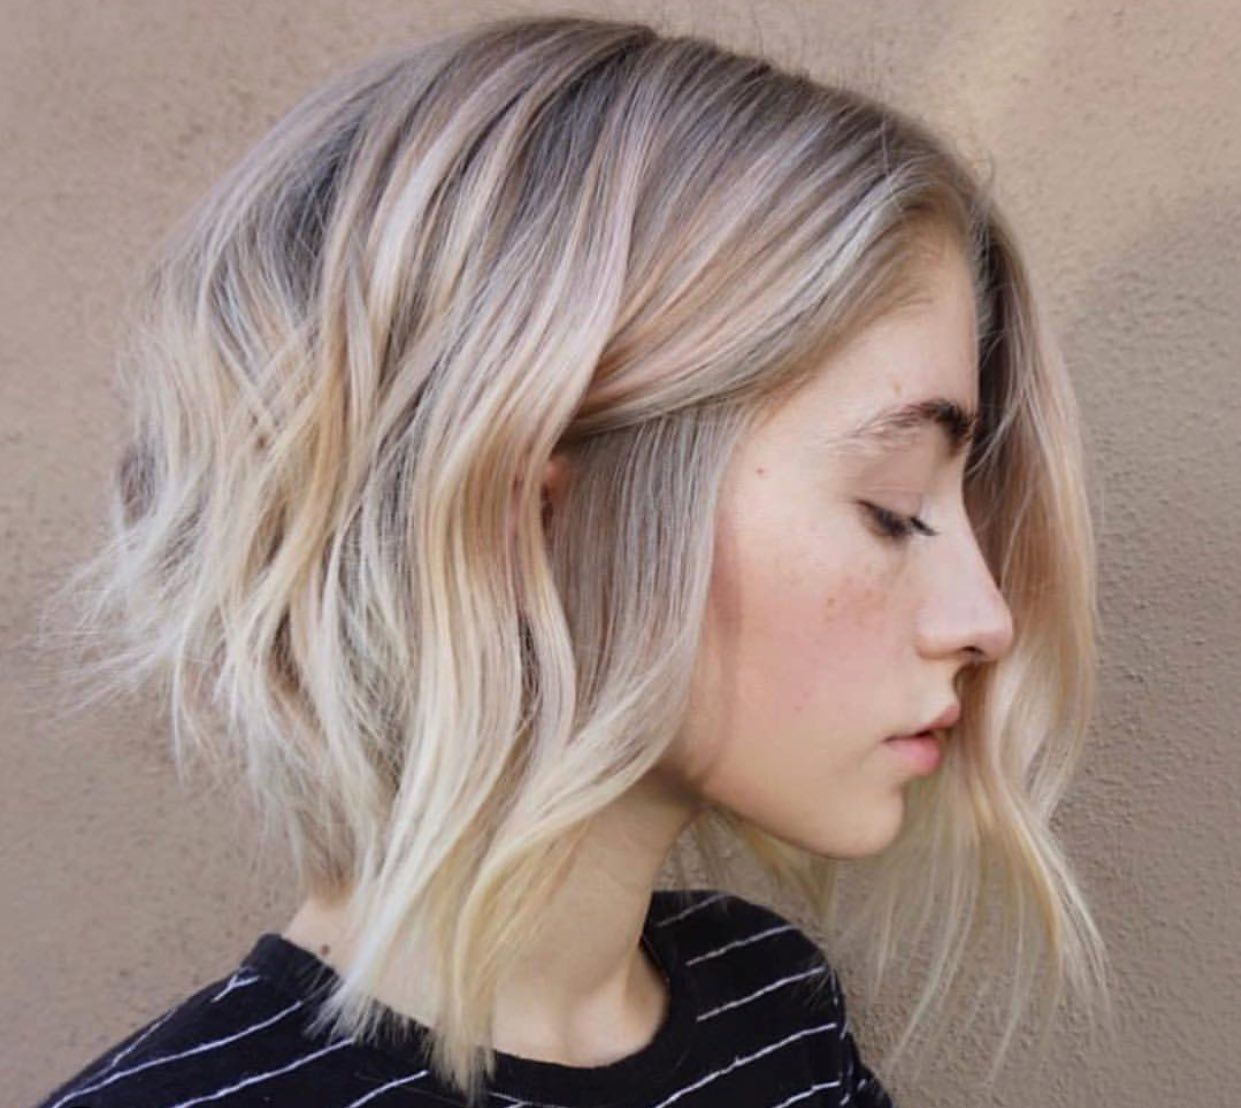 3 Barrel Curling Iron Short Hair Best Short Hair Styles